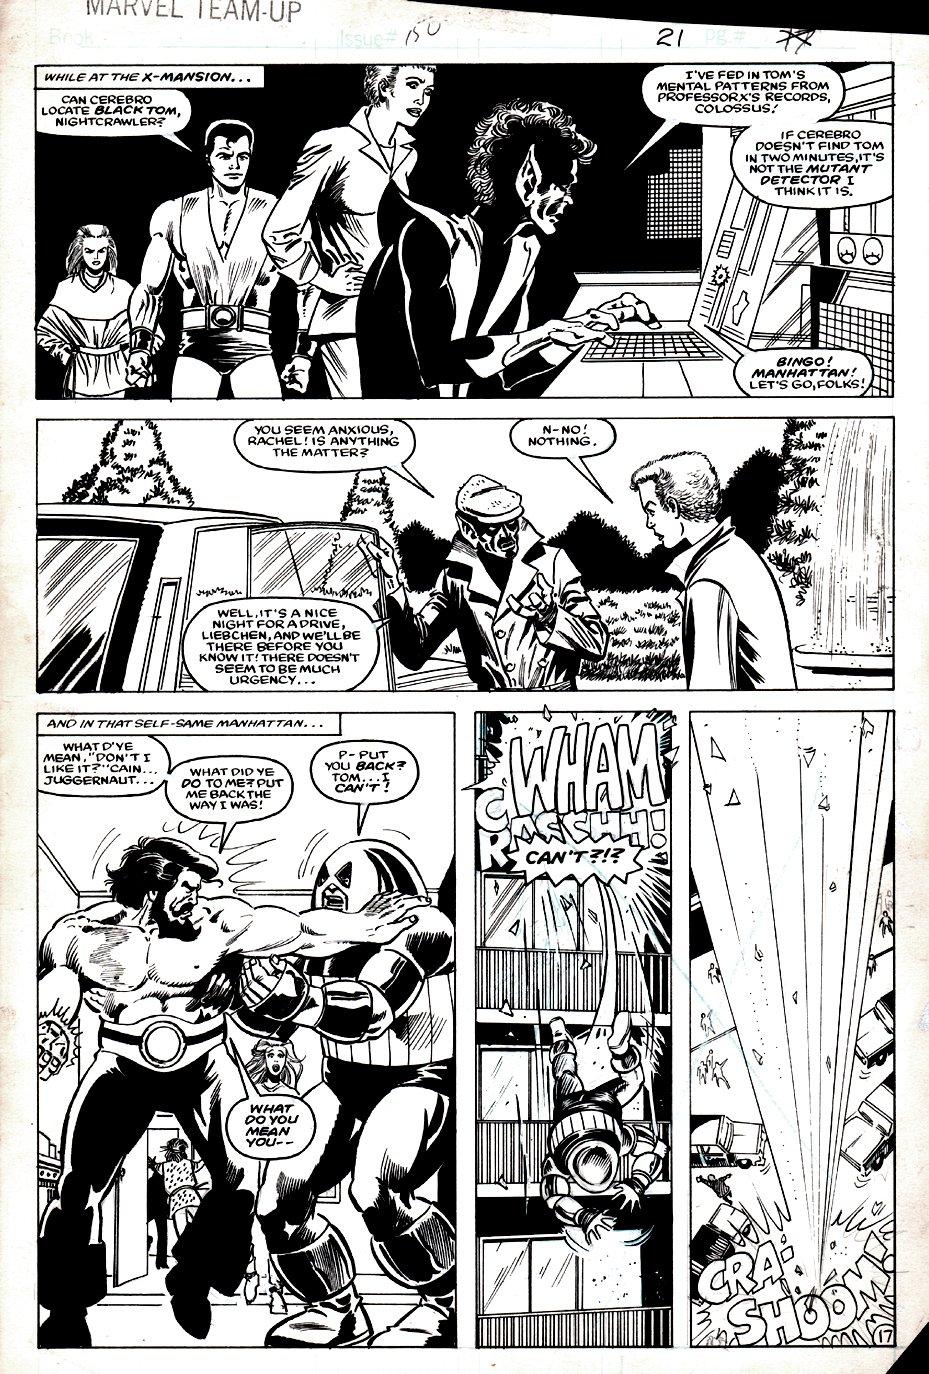 Marvel Team-Up #150 p 17 (SOLD LIVE ON 'DUELING DEALERS OF COMIC ART' EPISODE #34 PODCAST ON 9-1-2021